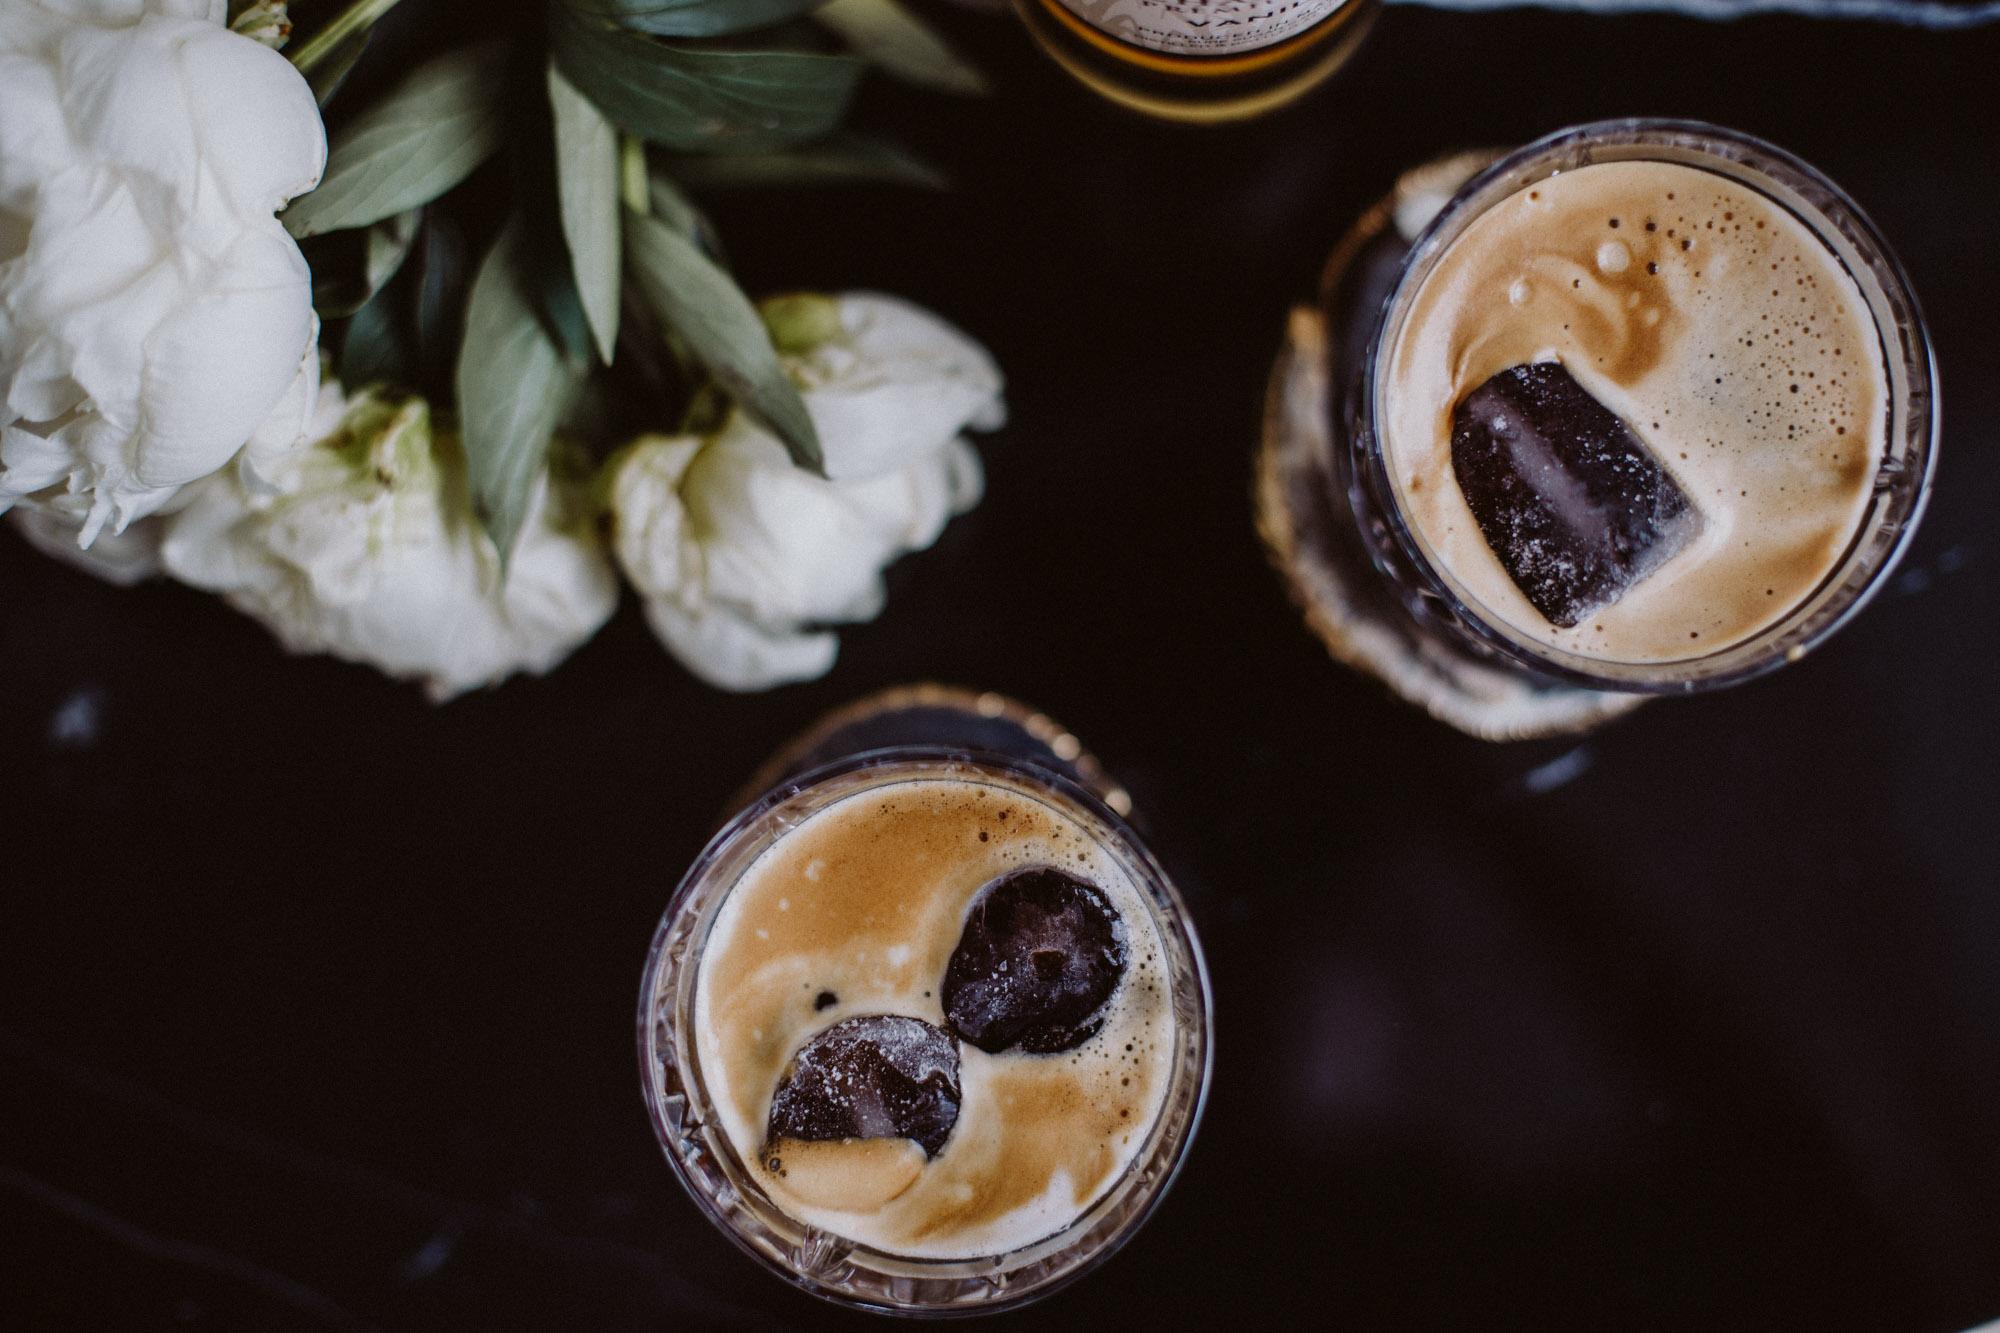 Bubbly Fridy: Boozy Iced Latte